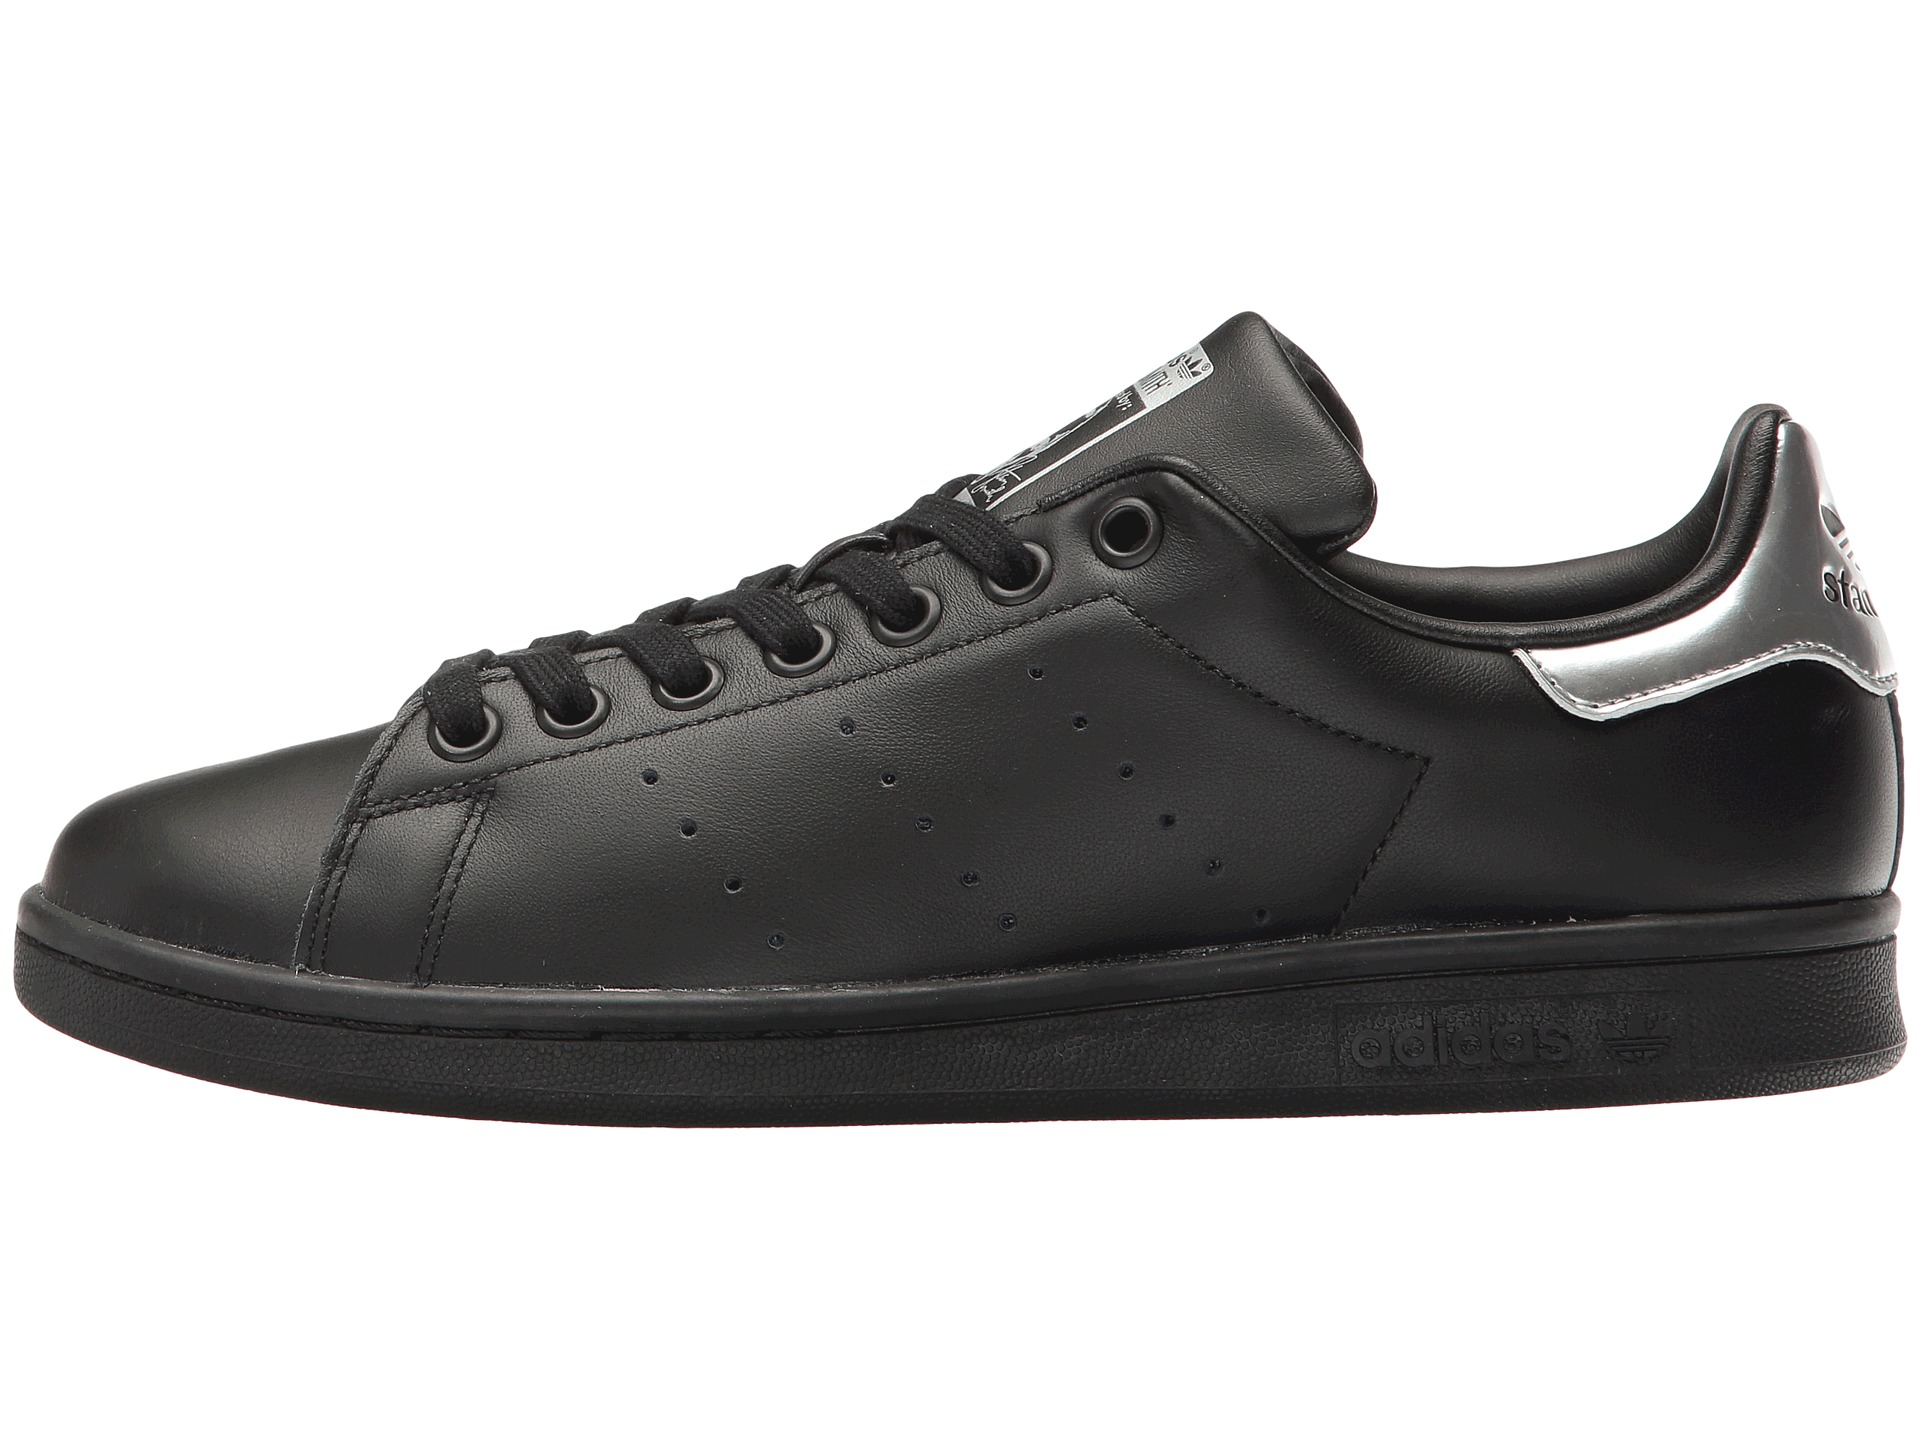 sale retailer f0df8 5d67b Buy adidas stan smith zappos - 51% OFF